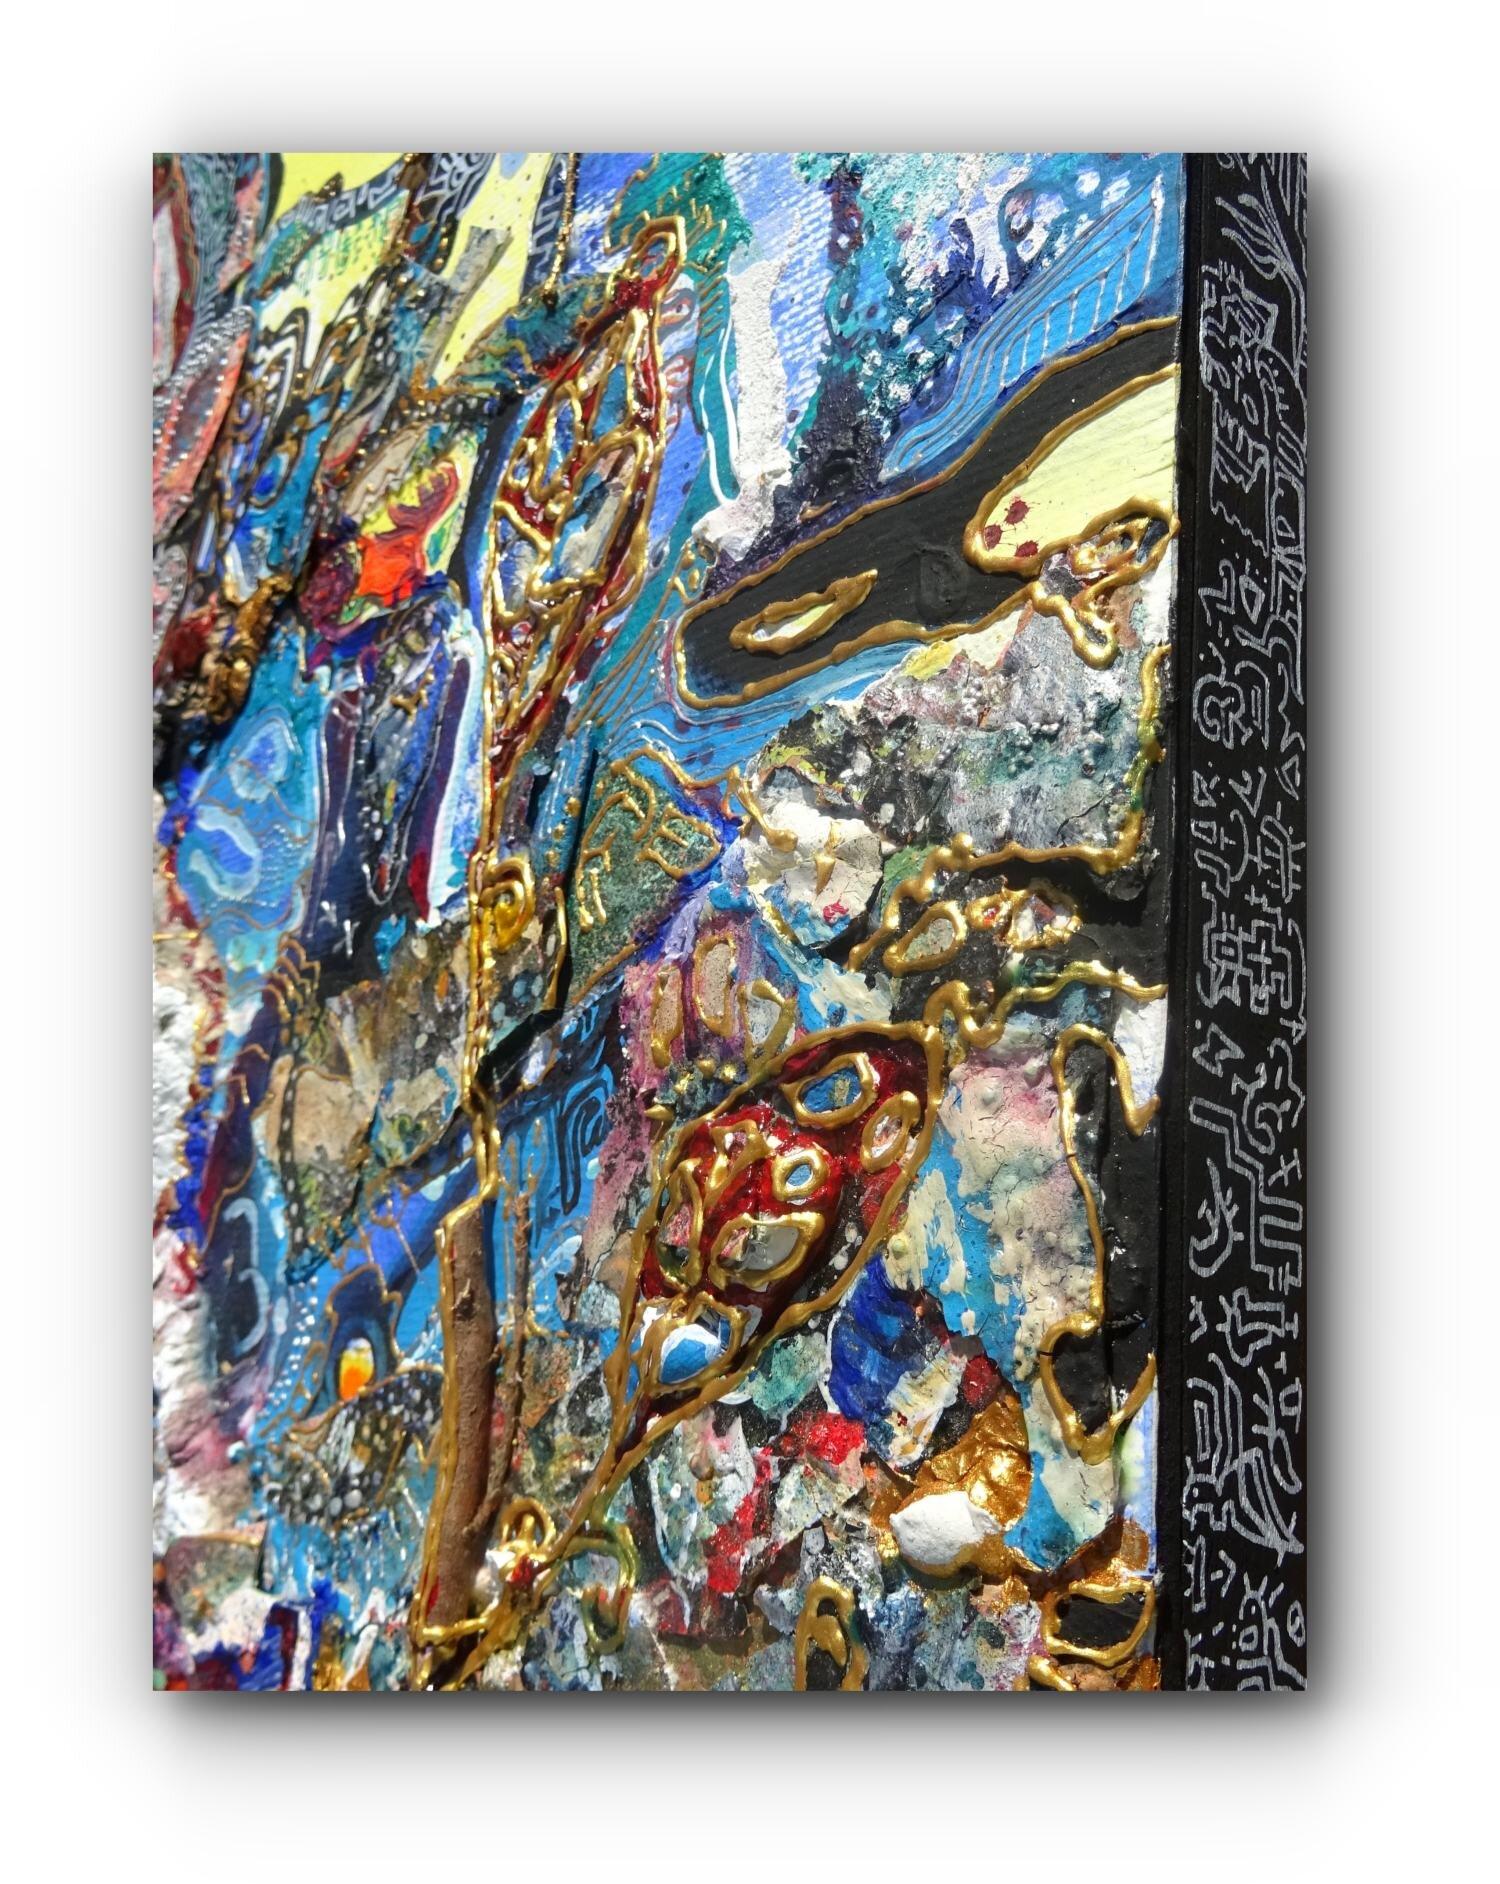 painting-celestial-summit-d4-artist-duo-ingress-vortices.jpg